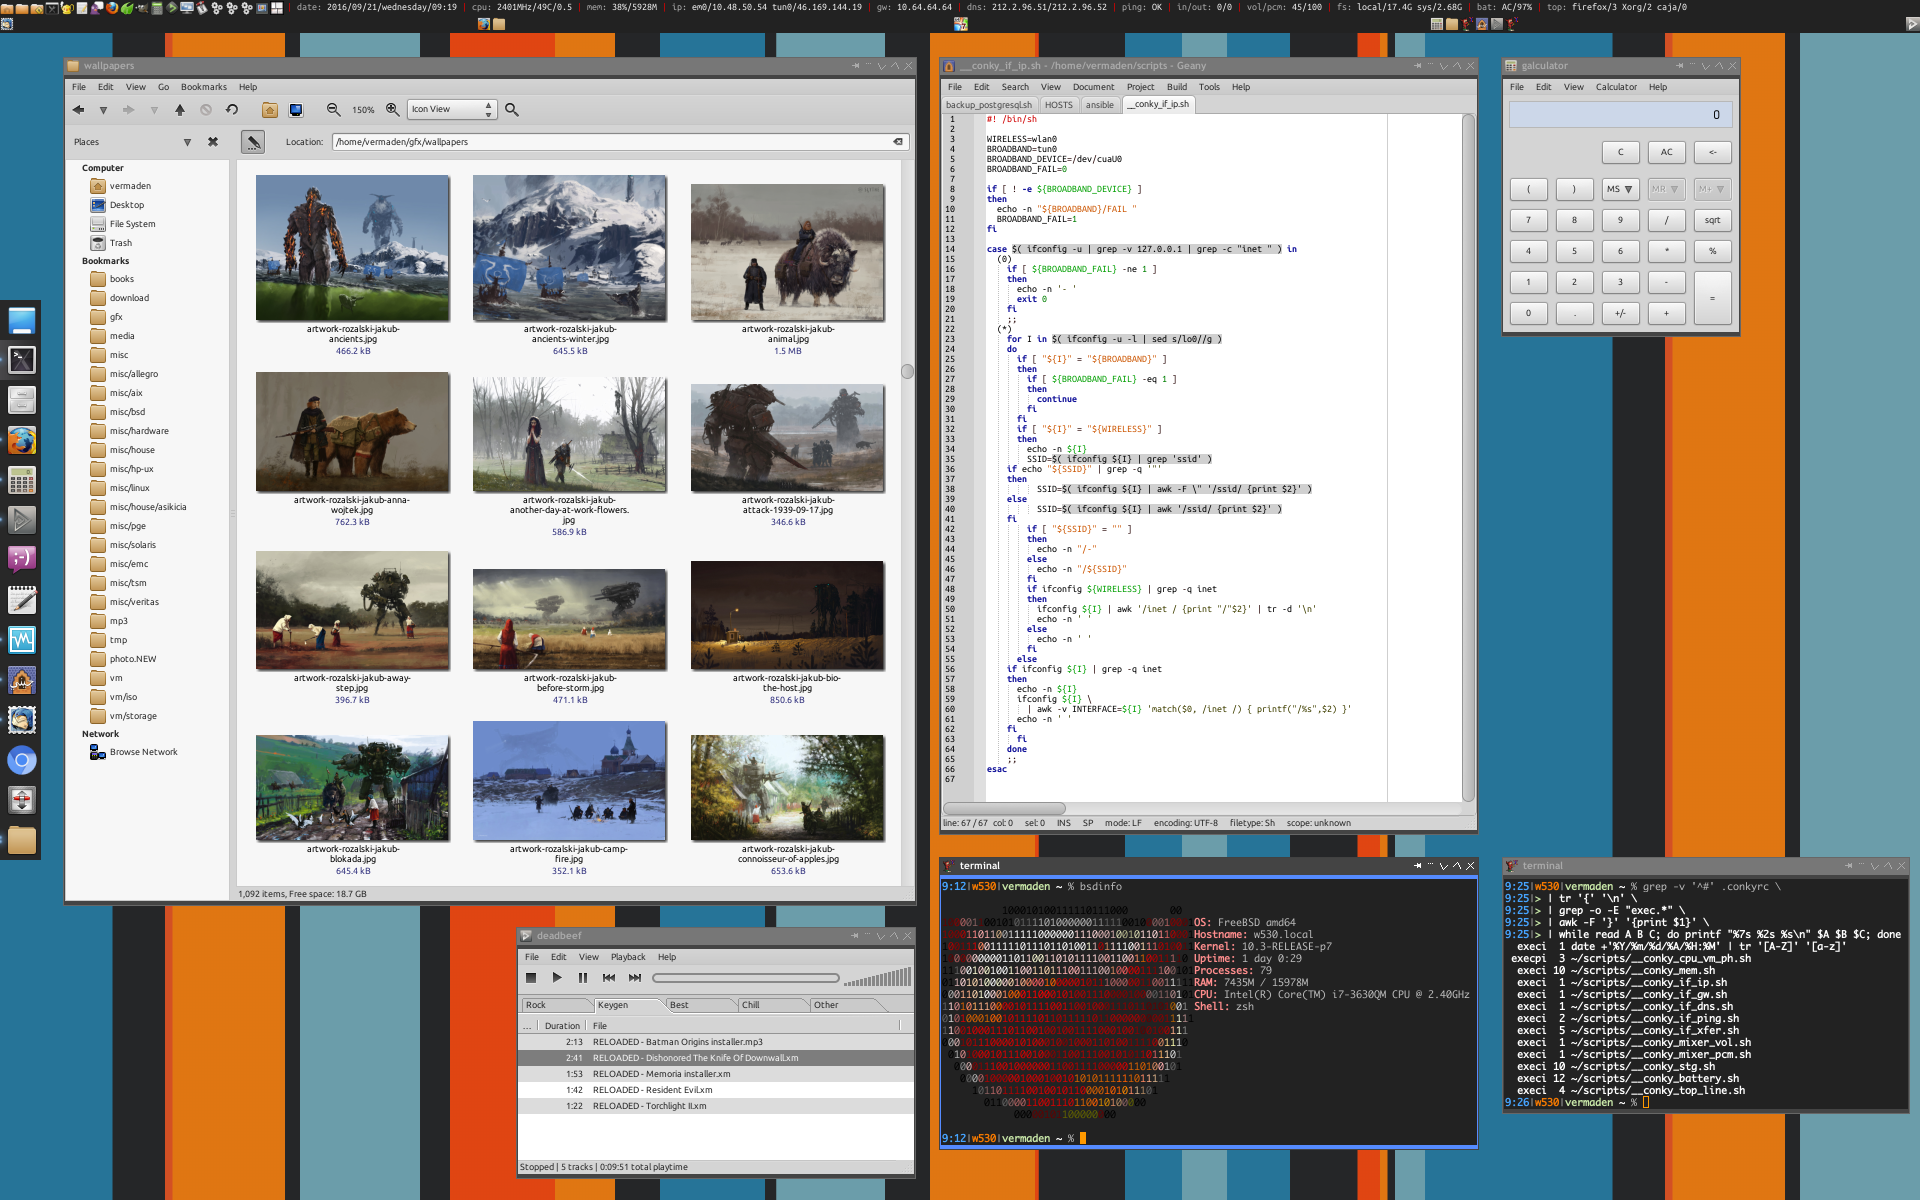 FreeBSD 10.3 Openbox